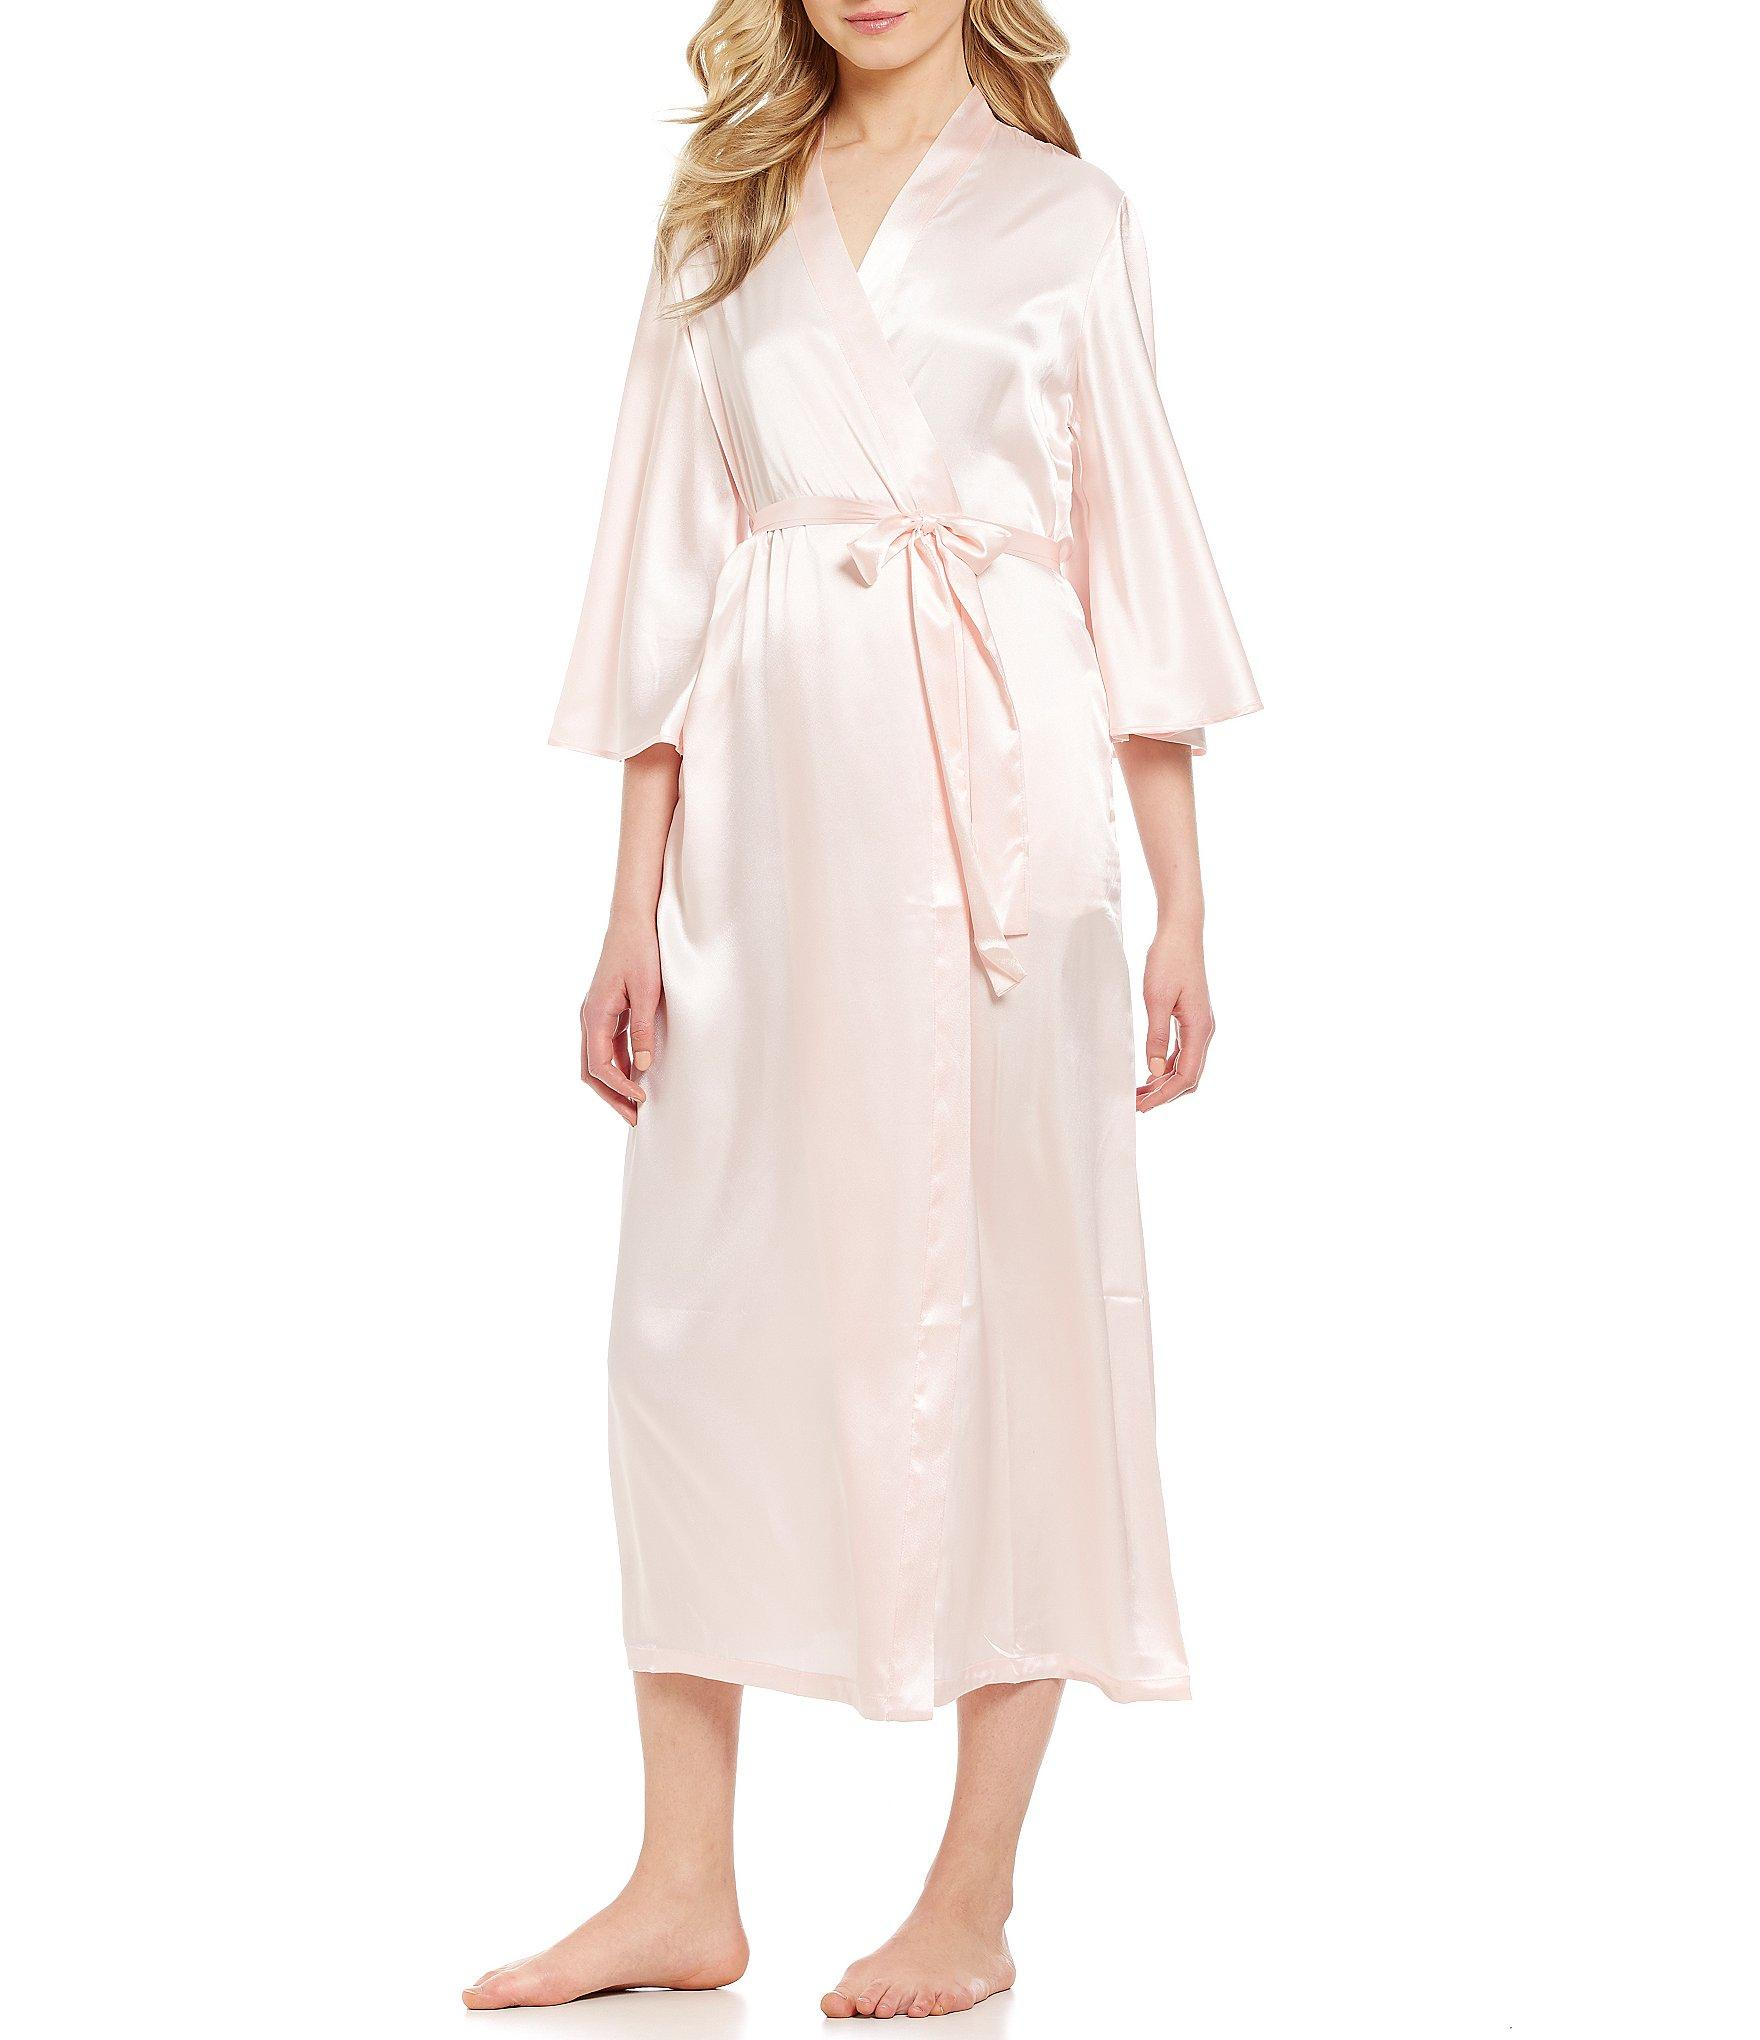 Oscar de la renta Pink Label Long Charmeuse Wrap Robe in Pink  Lyst